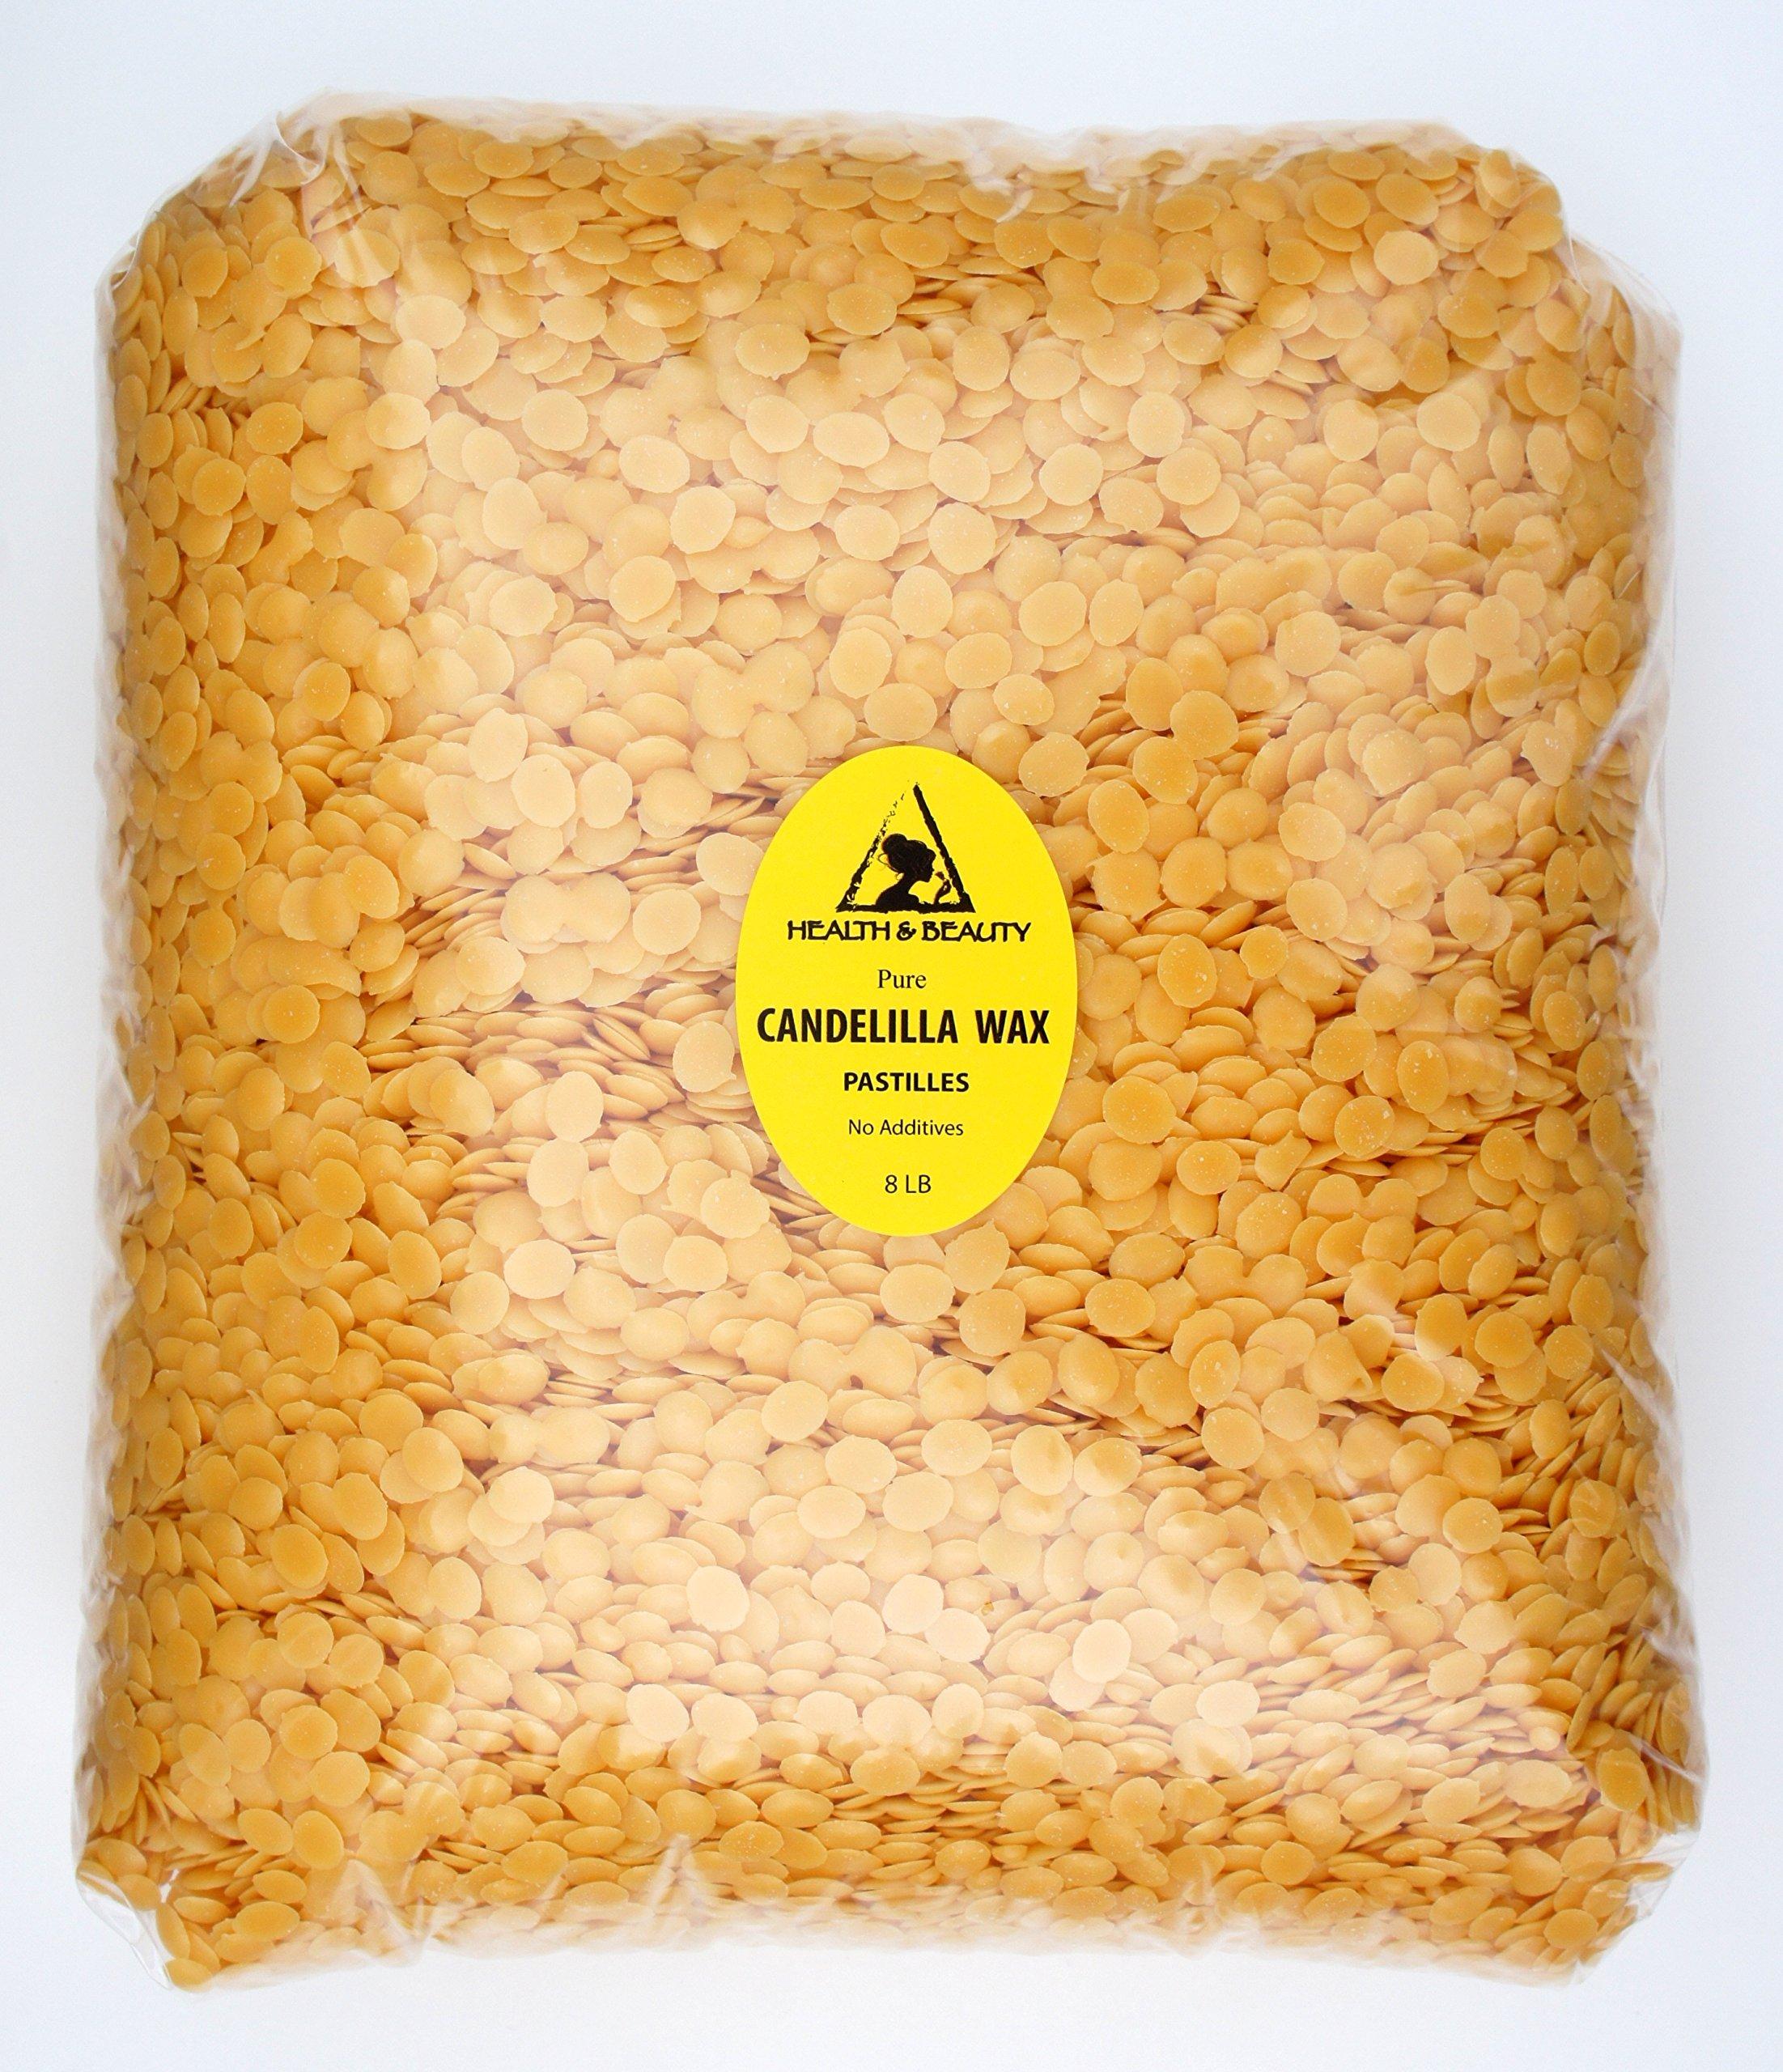 Candelilla Wax Flakes Organic Vegan Pastilles Beards Premium Prime Grade A 100% Pure 8 LB by H&B Oils Center Co.